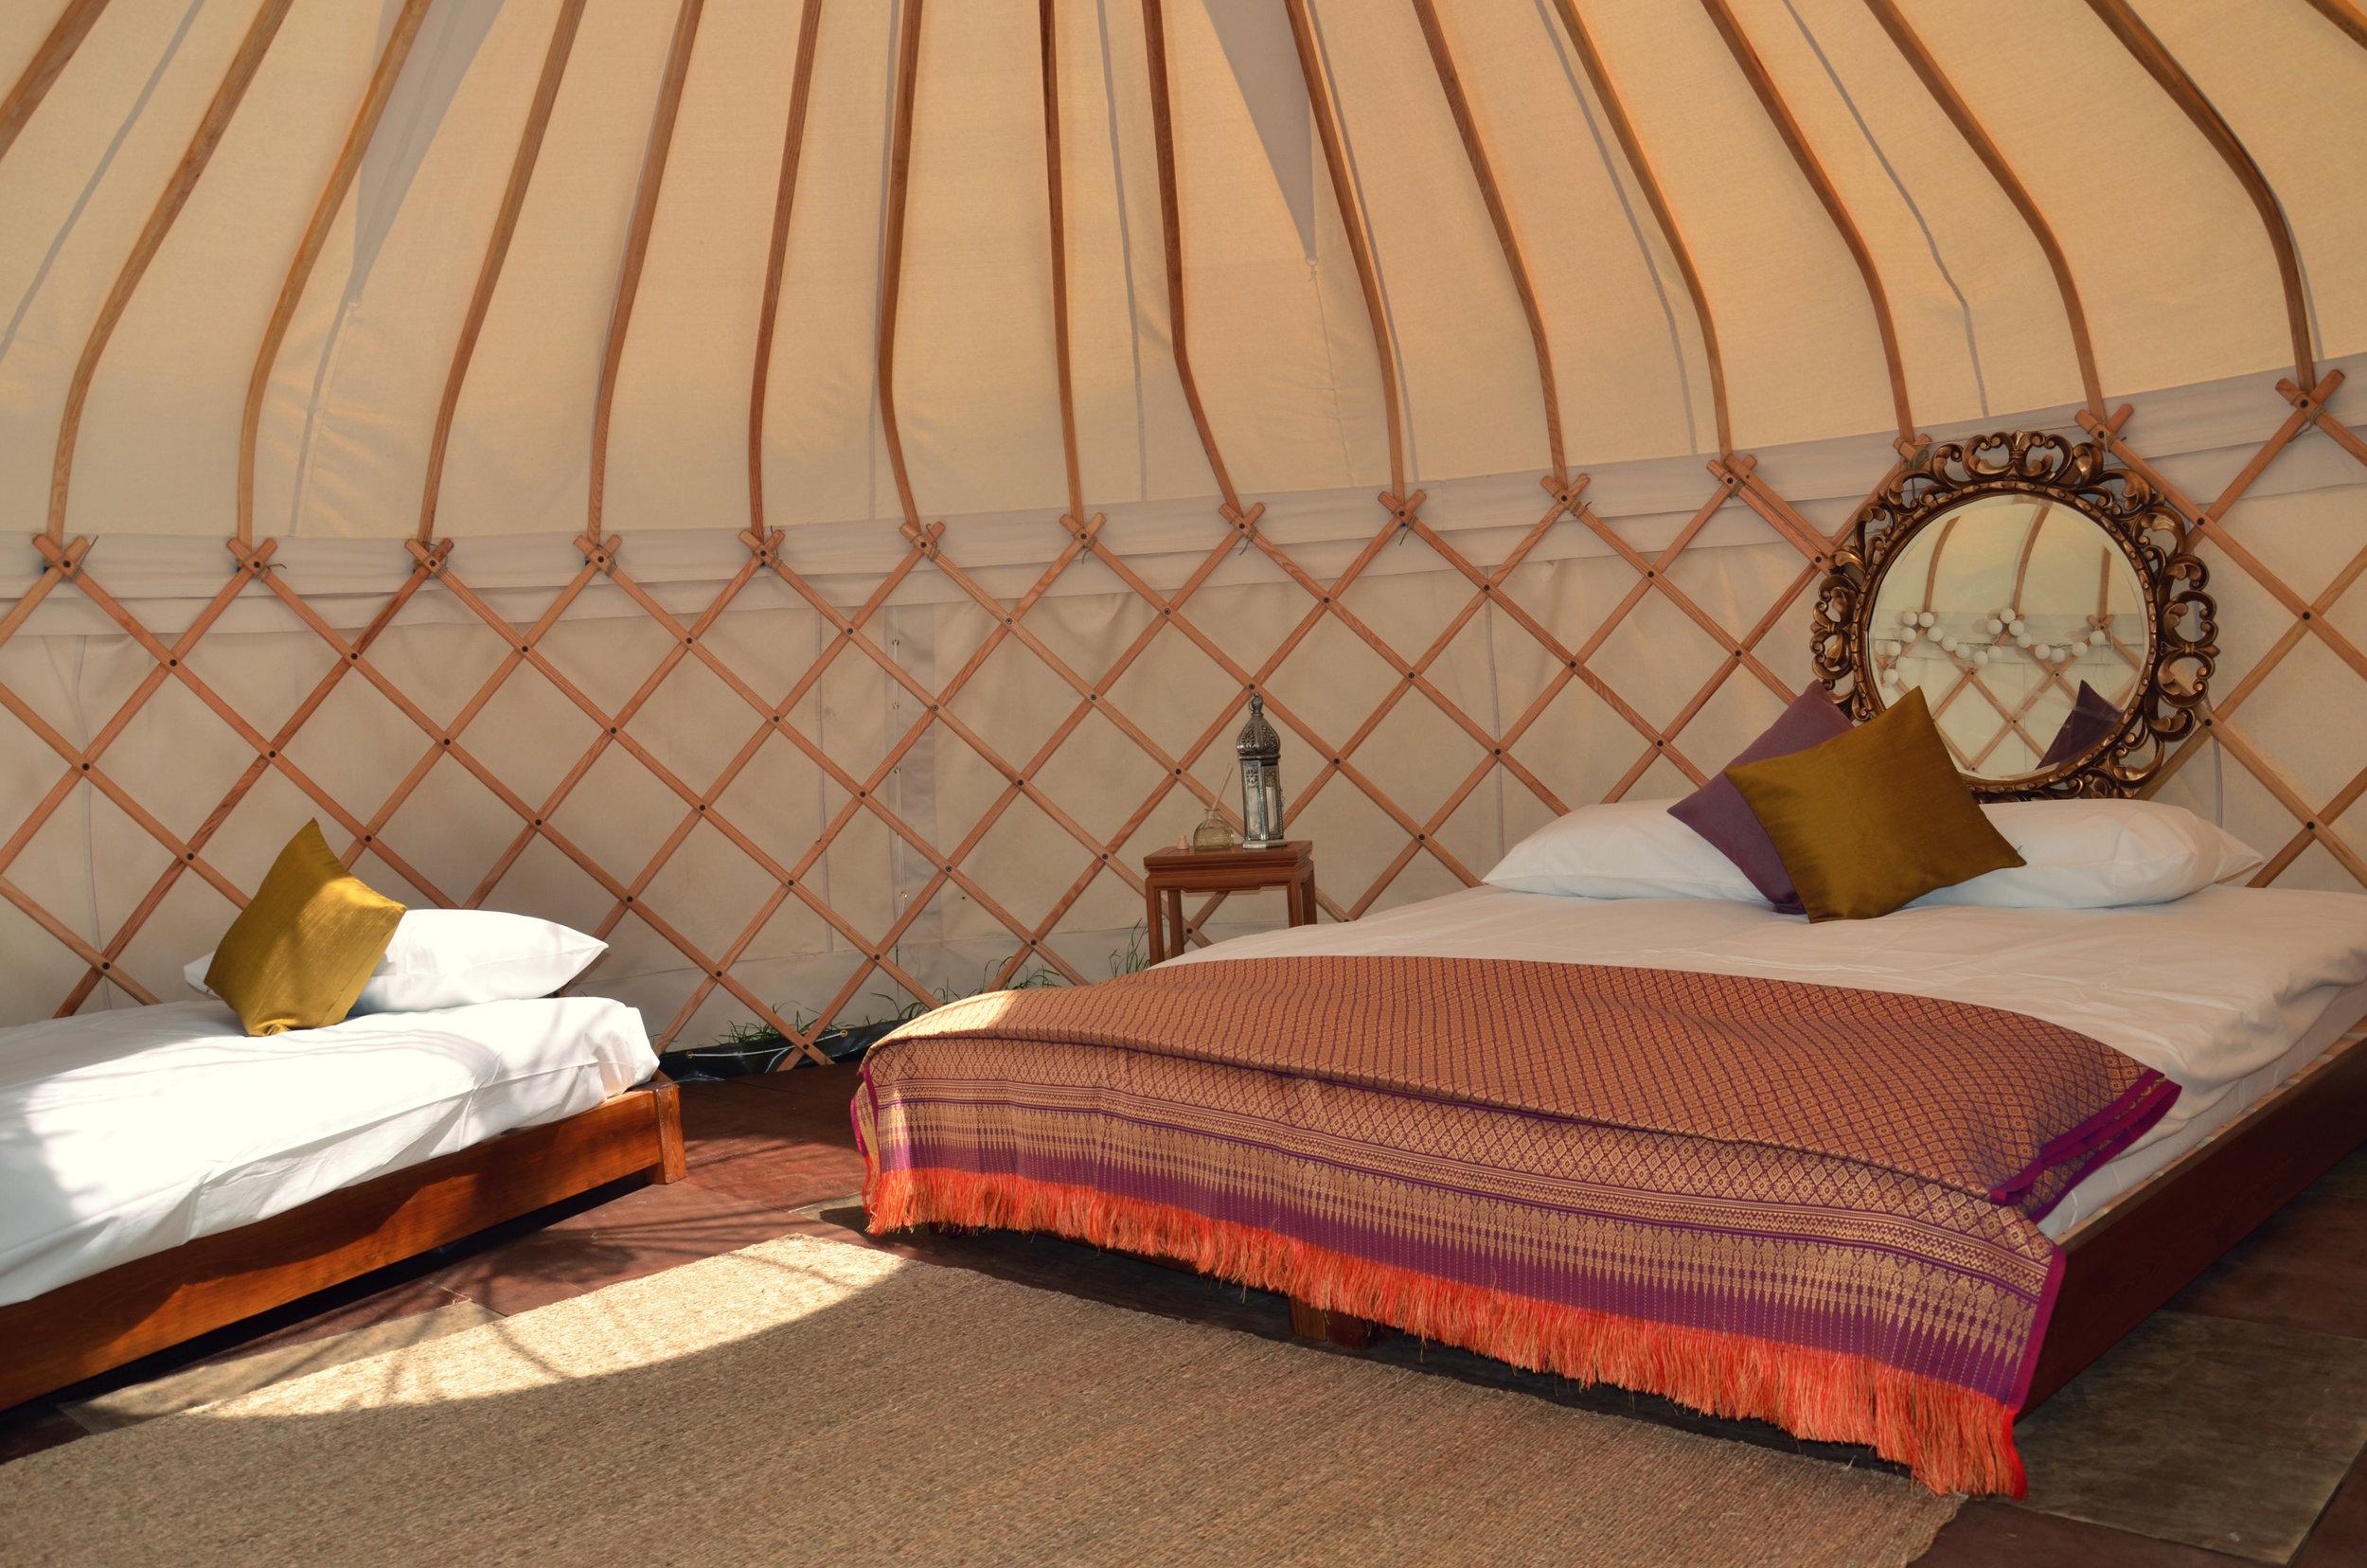 Luxury Yurt — Hotel Bell Tent